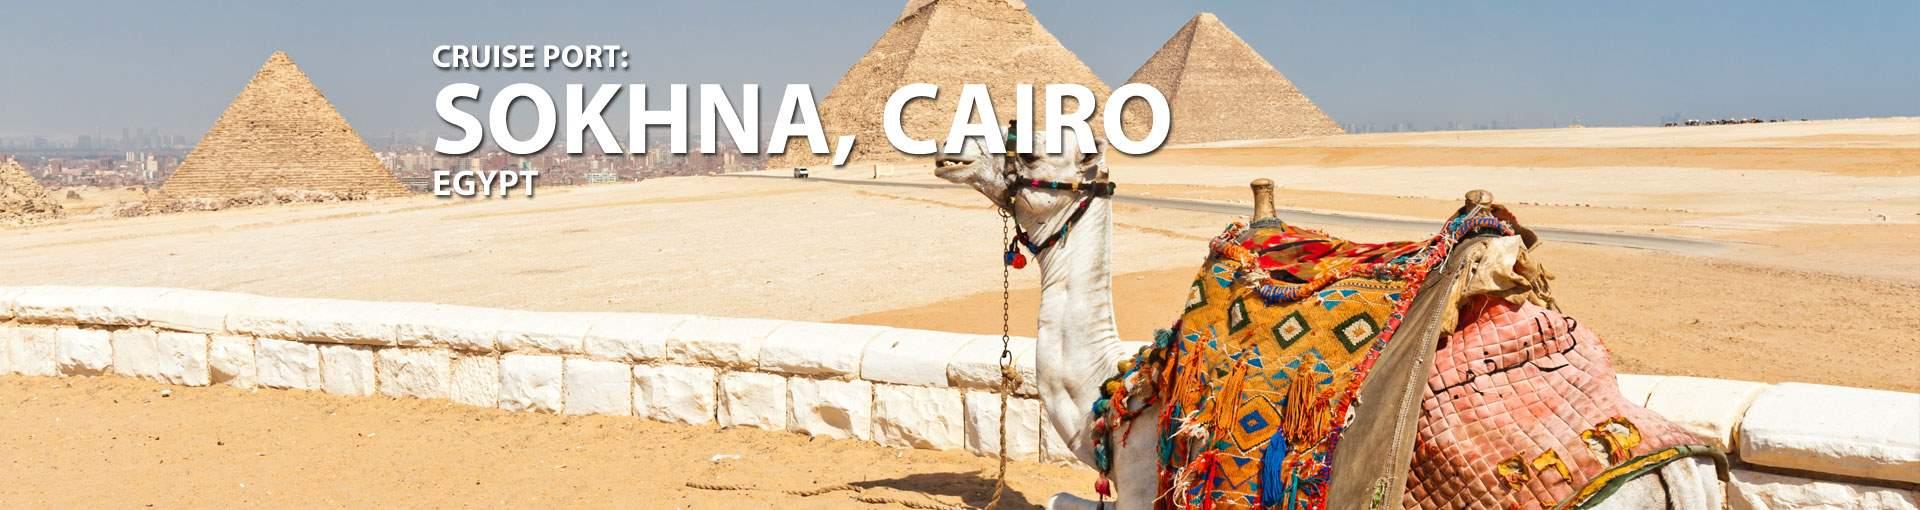 Cruises to Sokhna, Cairo, Egypt